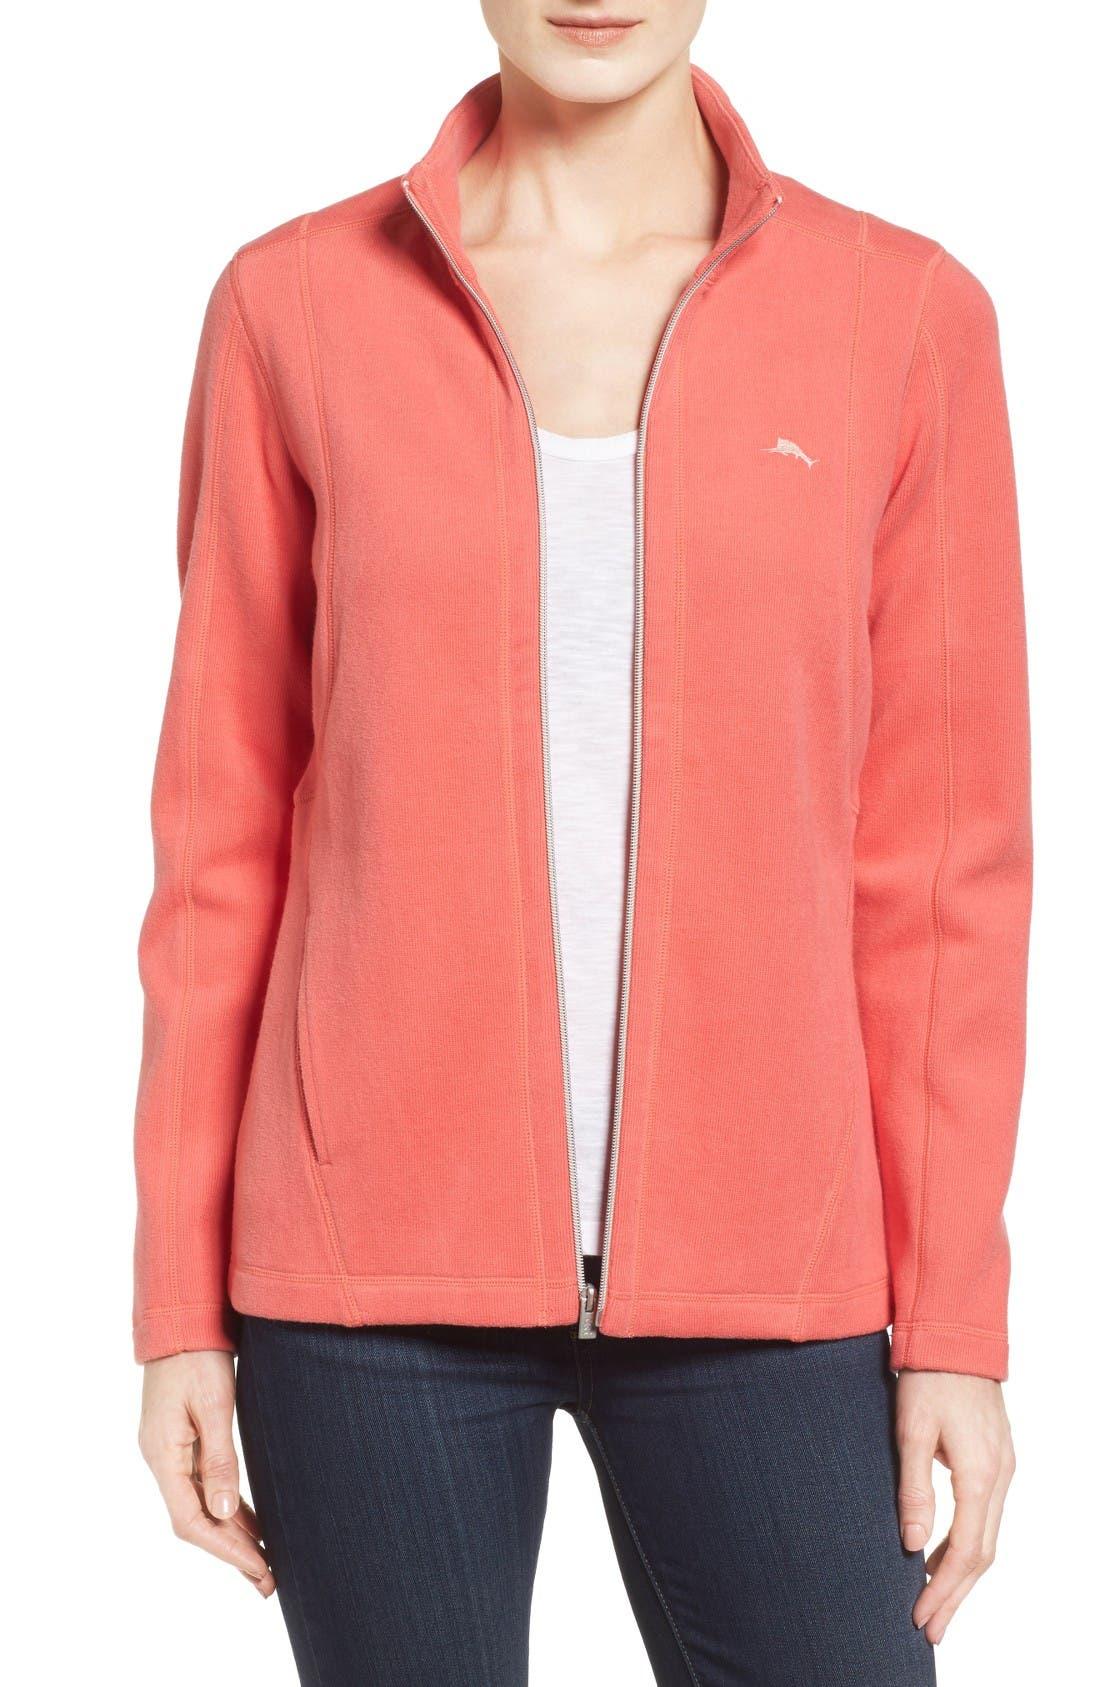 'Aruba' Full Zip Sweatshirt,                             Main thumbnail 1, color,                             Fusion